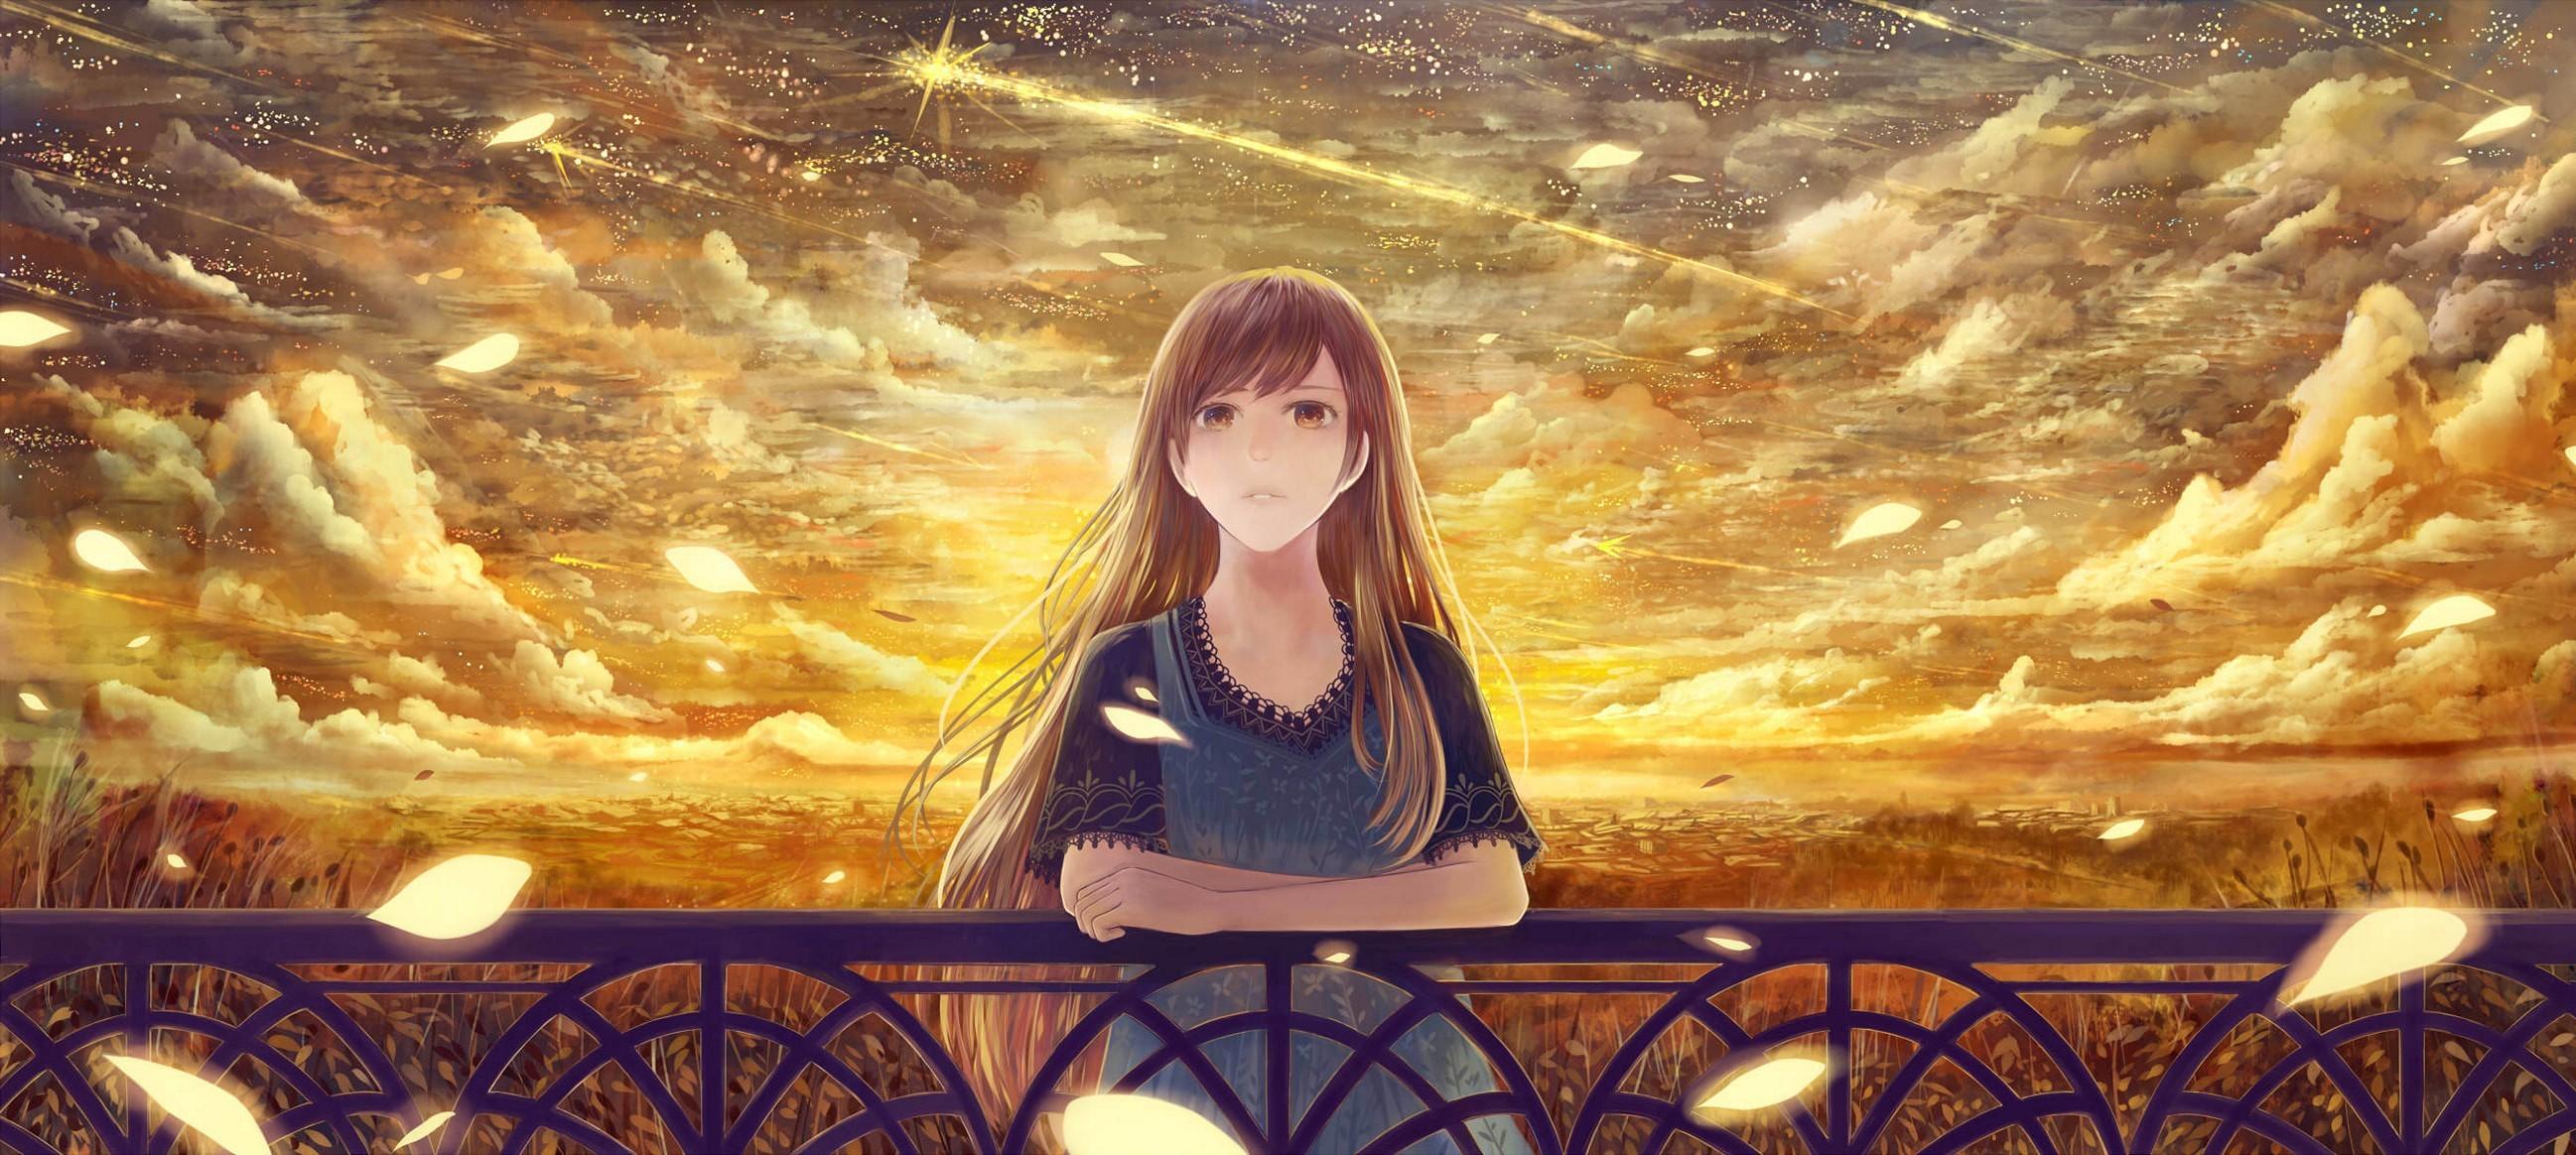 Girl Fence Starry Sky Majestic Sad Anime Wallpaper